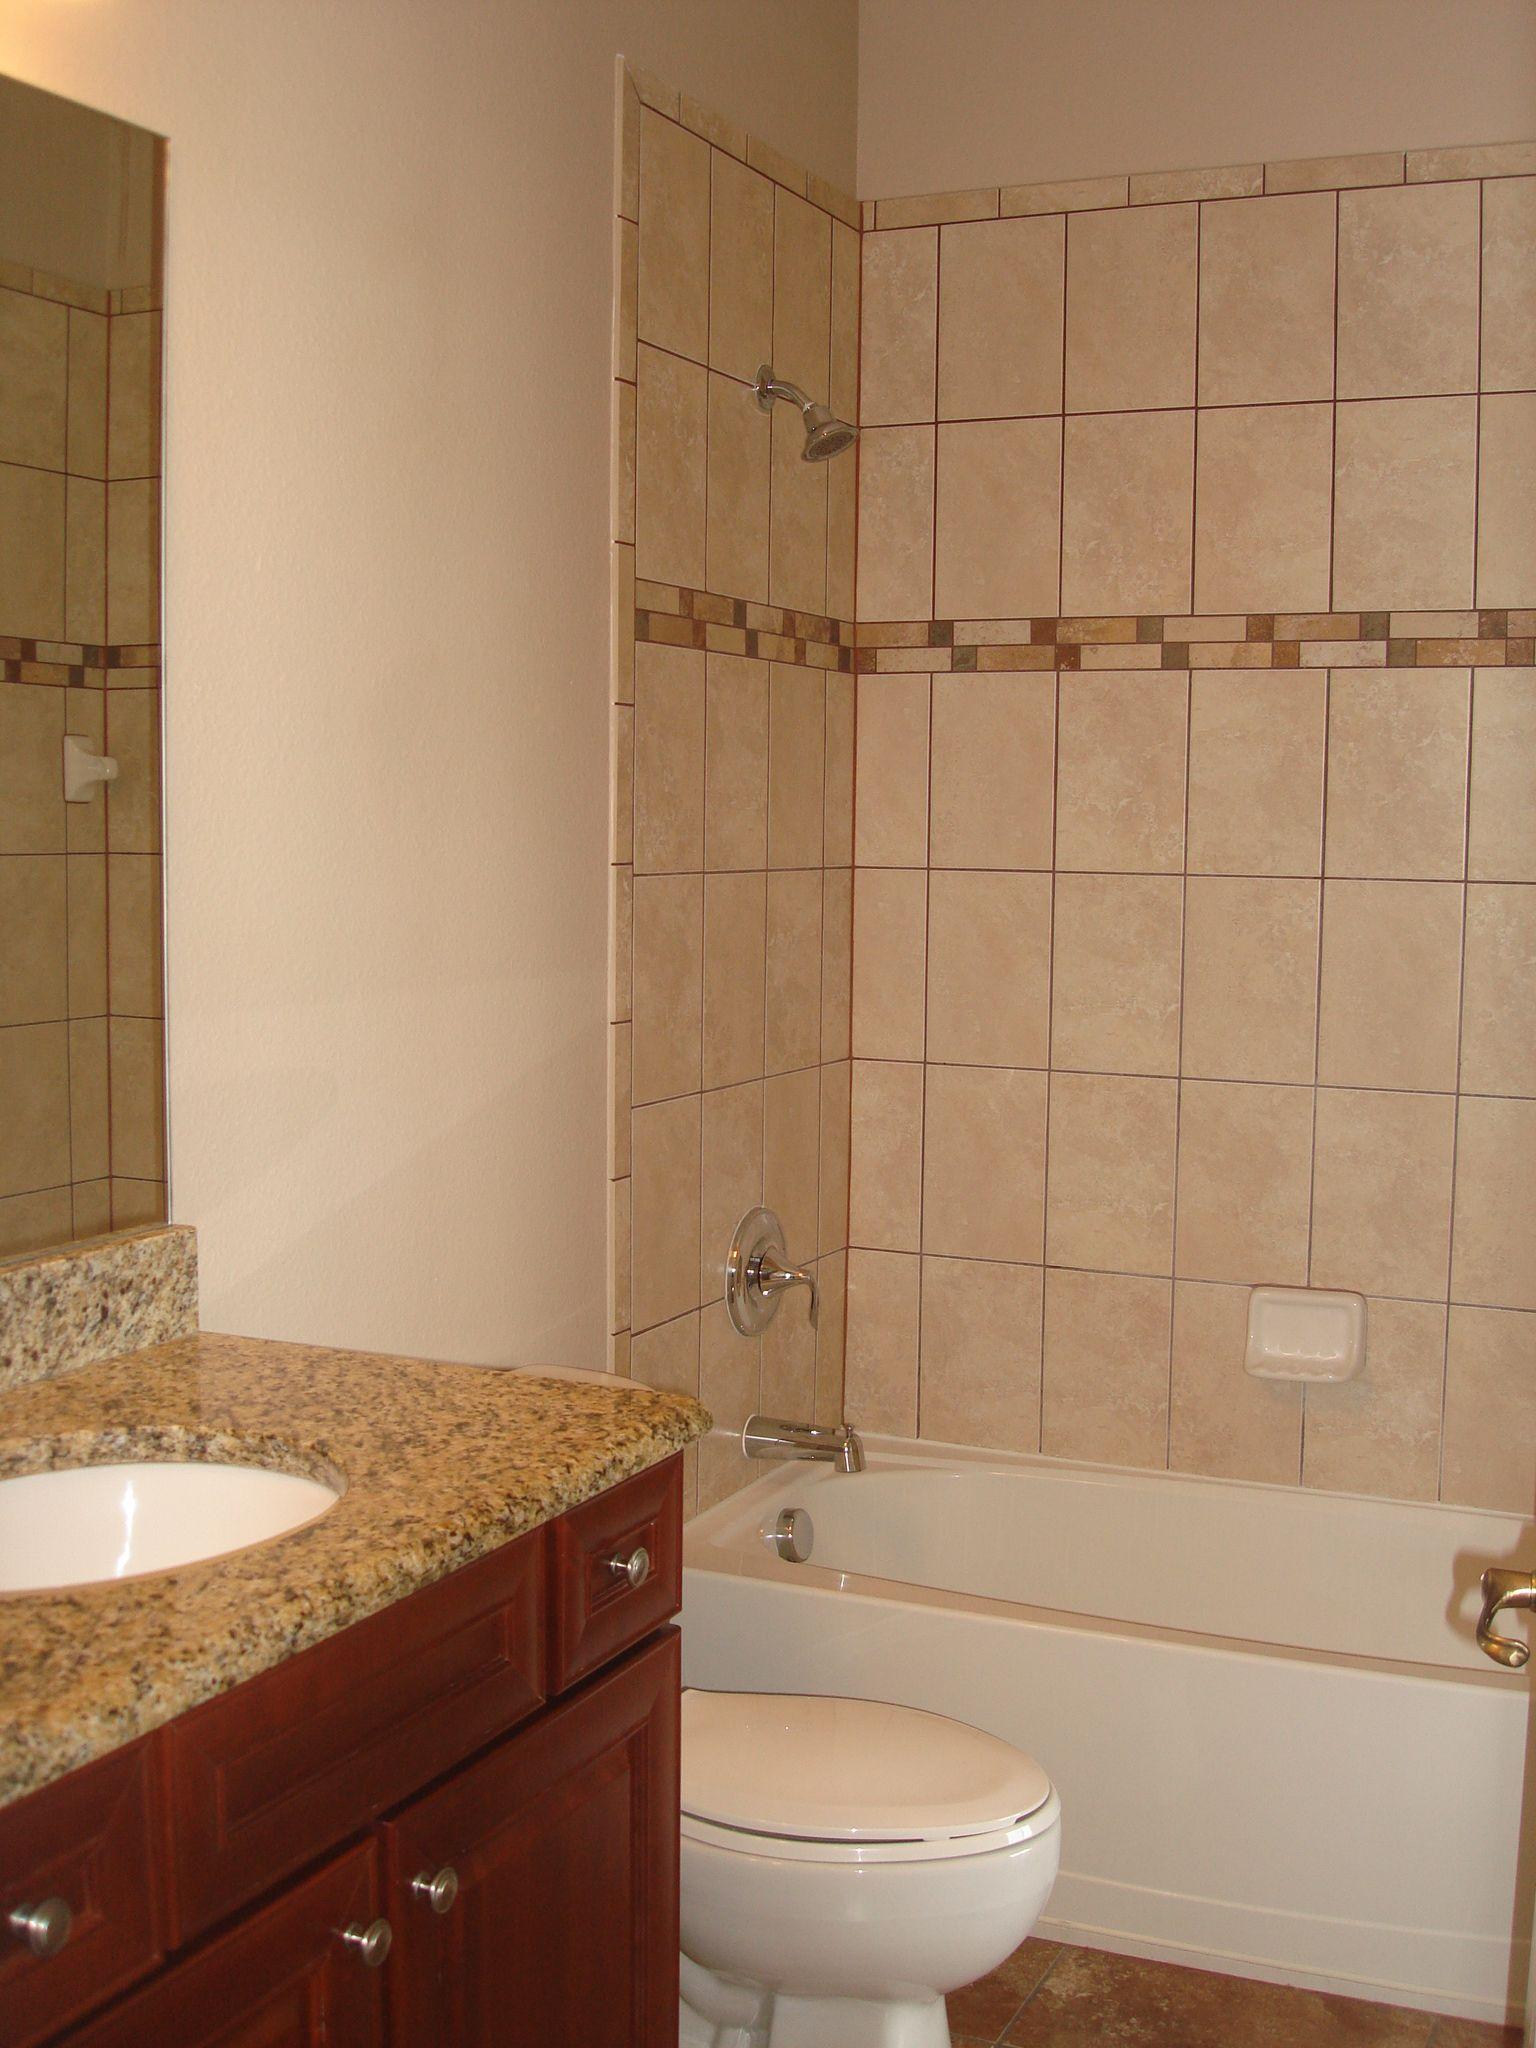 Kinley 2x2 W Den Guest Bathroom At Urbana Www Urbanaluxuryapts Com Luxury Apartments Guest Bathroom Luxury Amenities